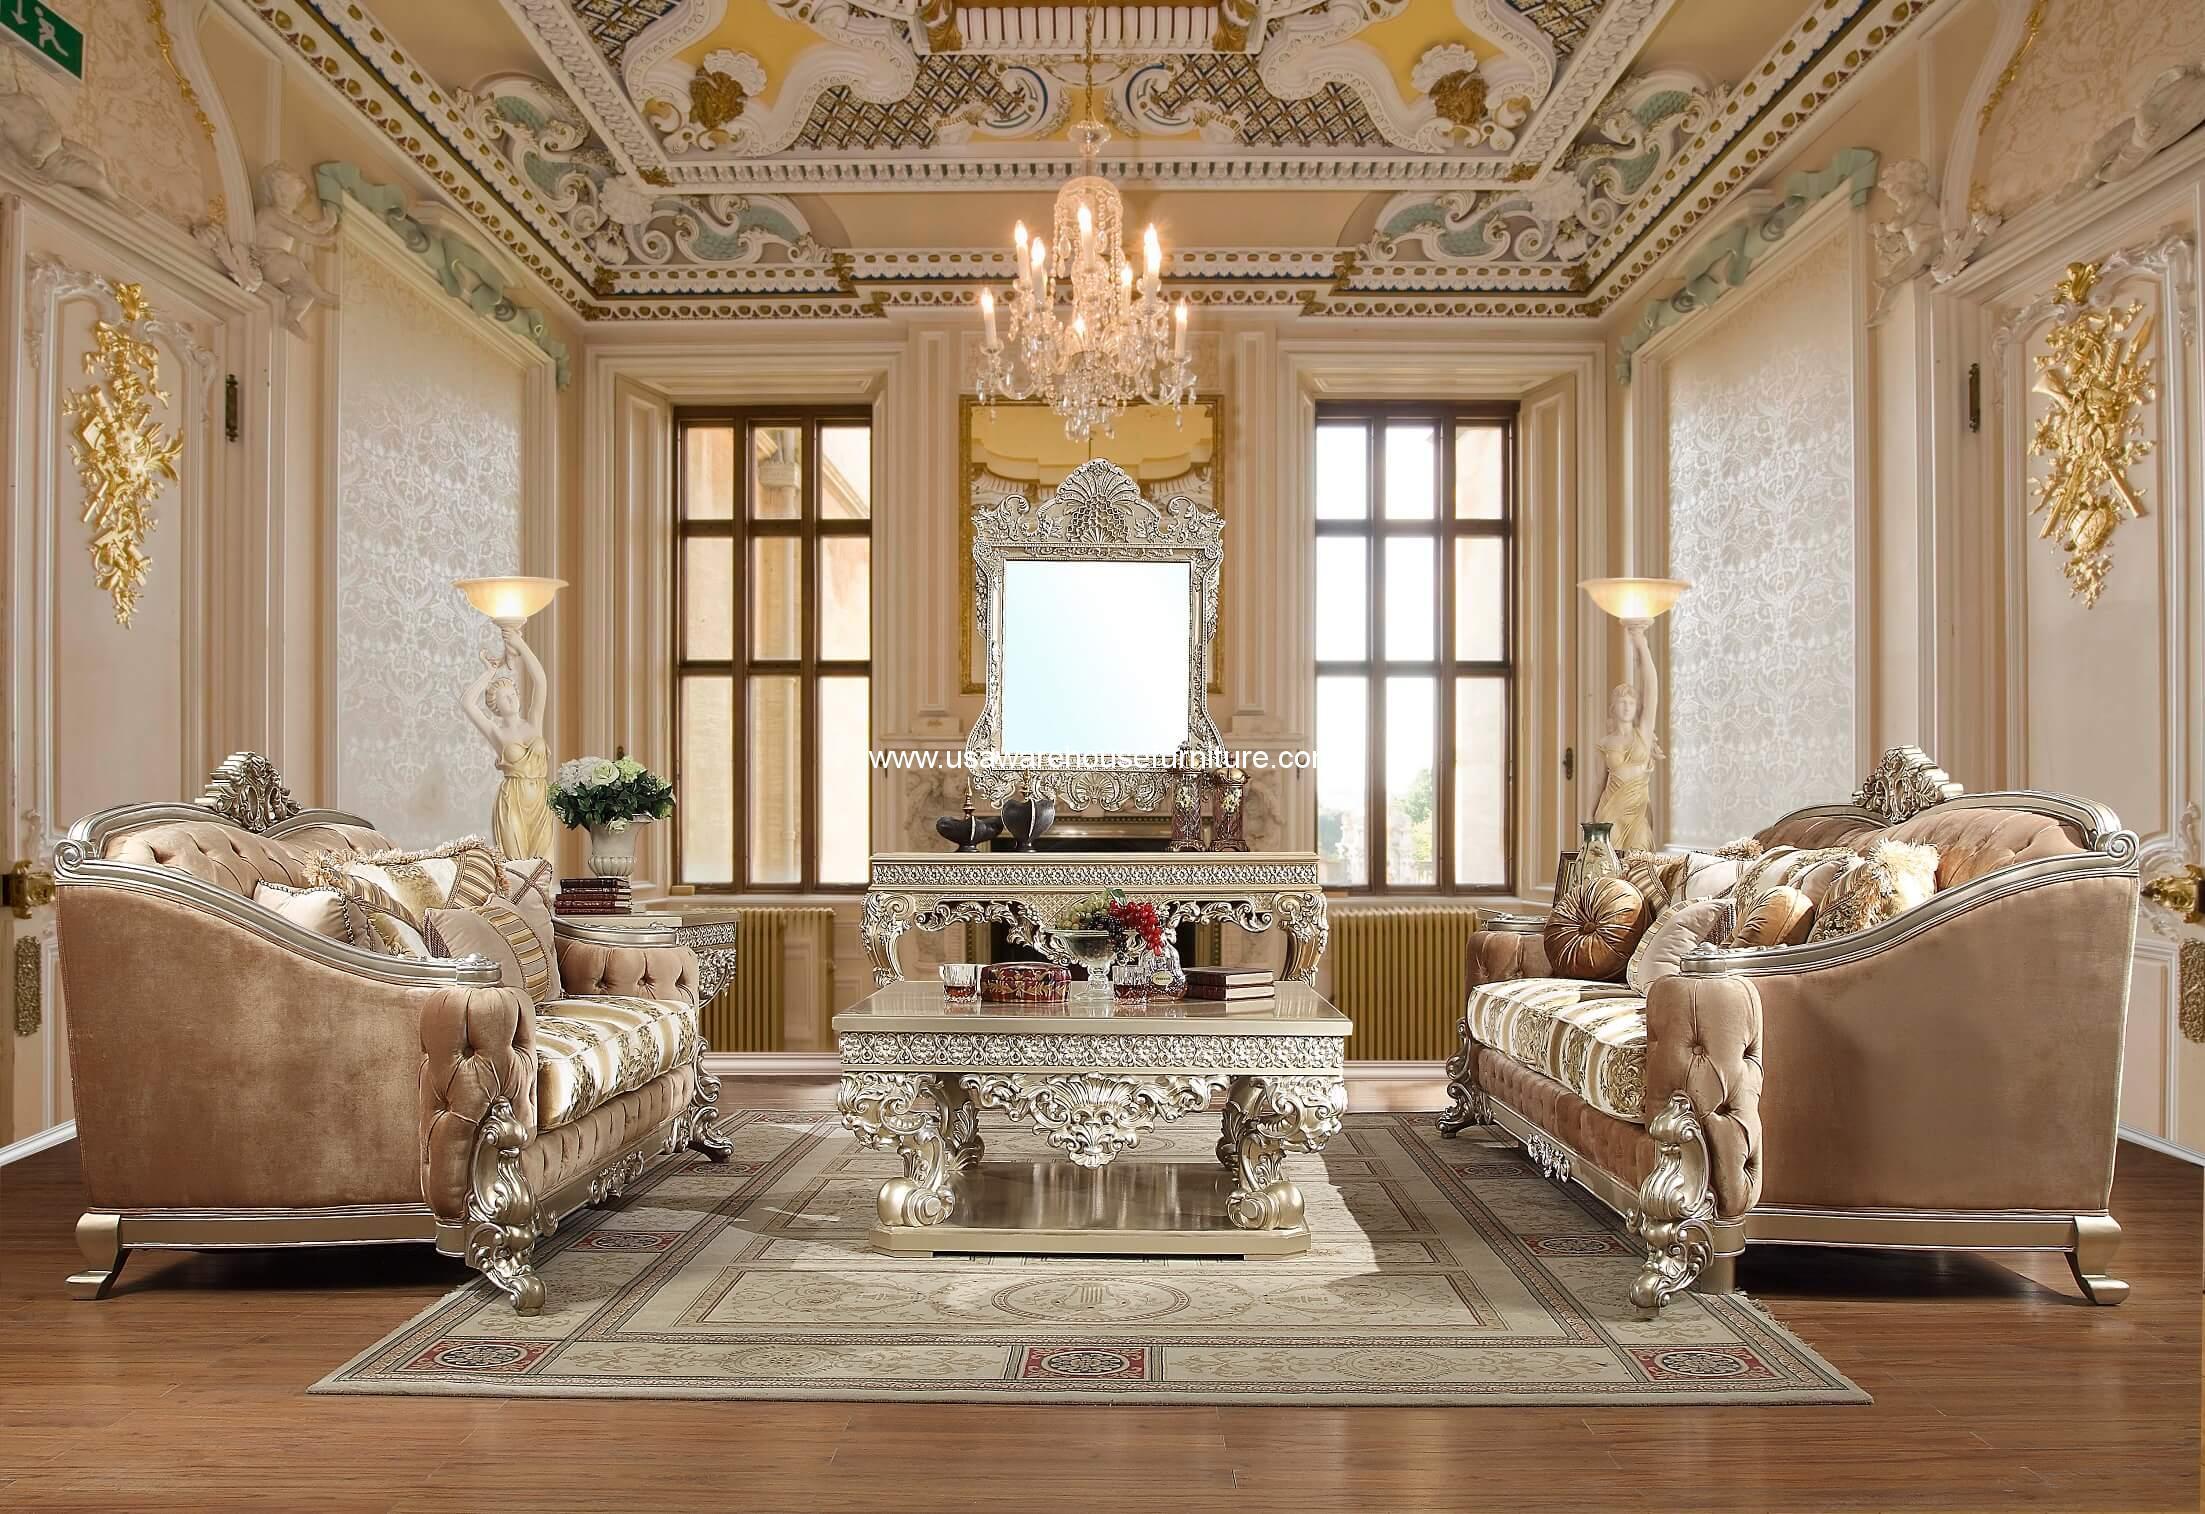 Royal Palace Sofa Set Homey Design Hd 820 Usa Warehouse Furniture